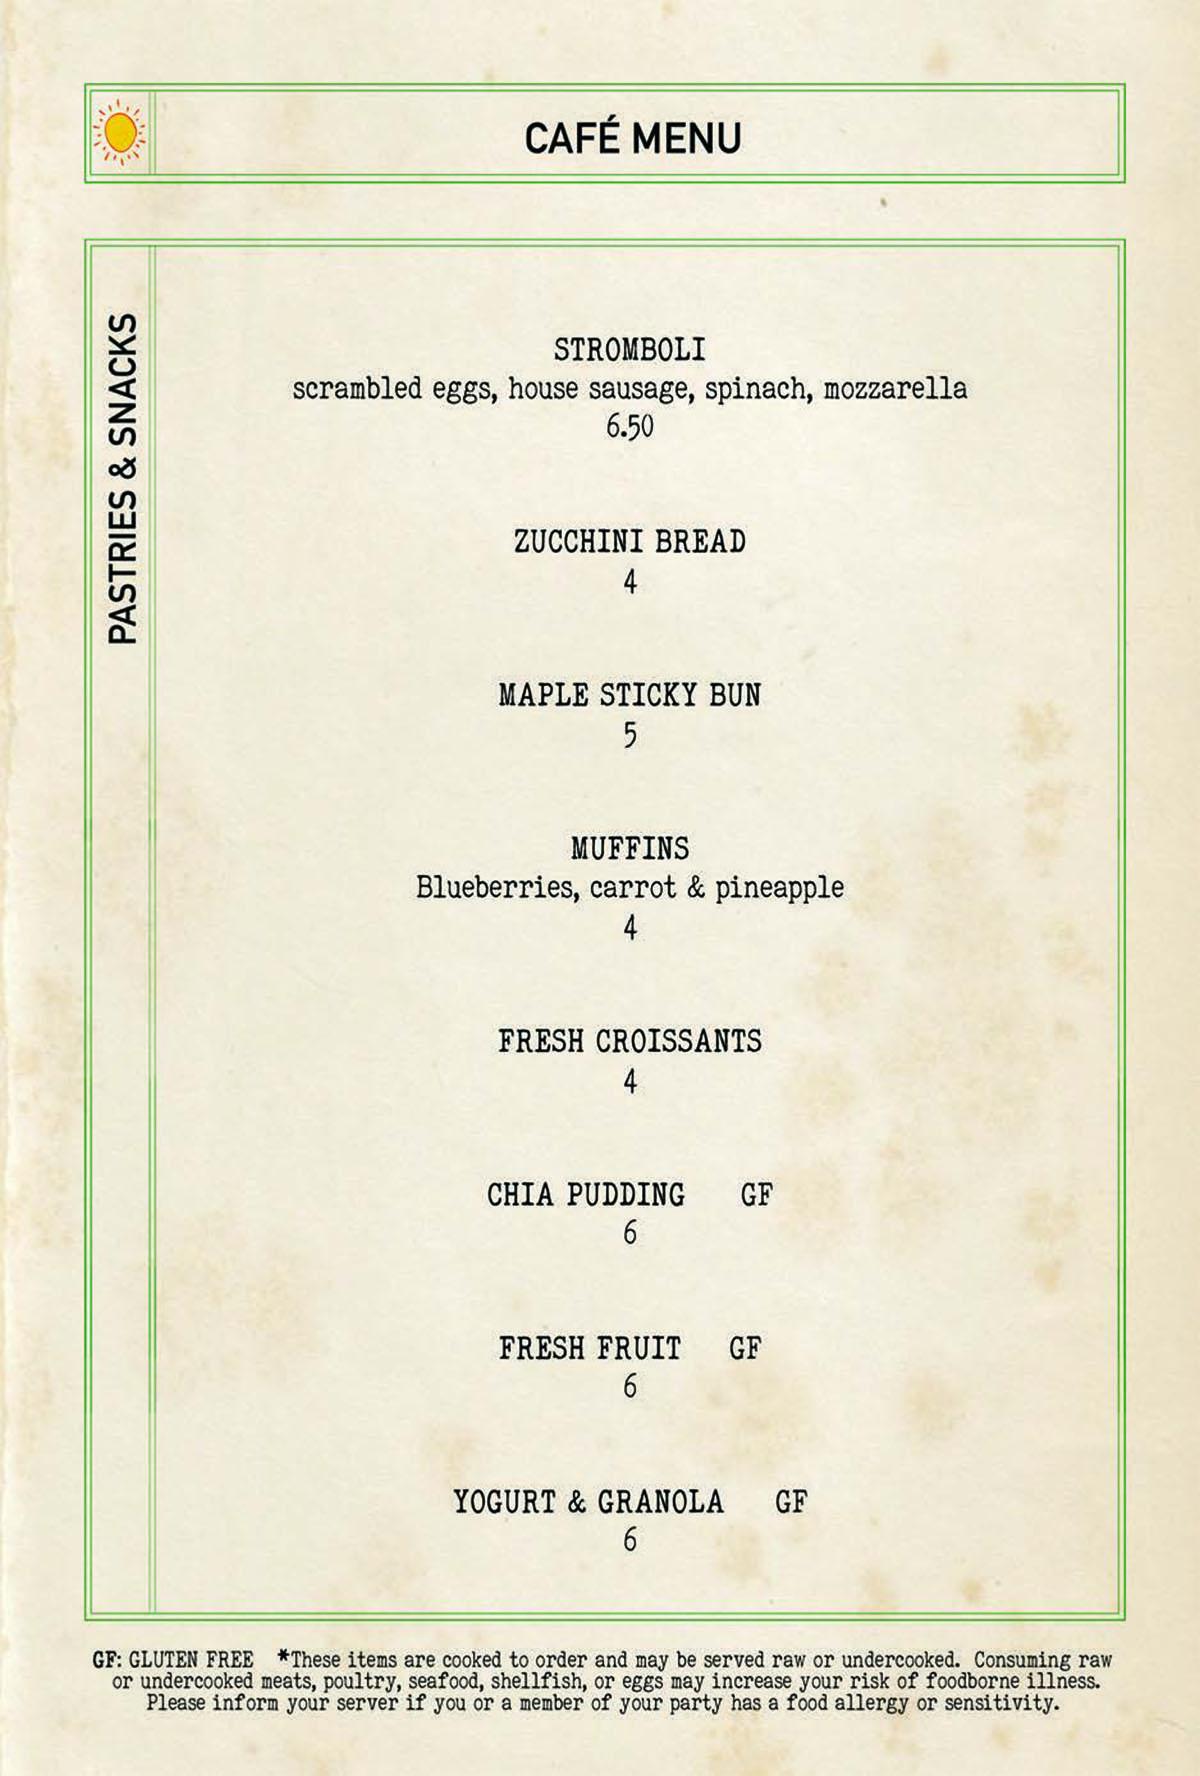 Bar Mercato cafe menu 1